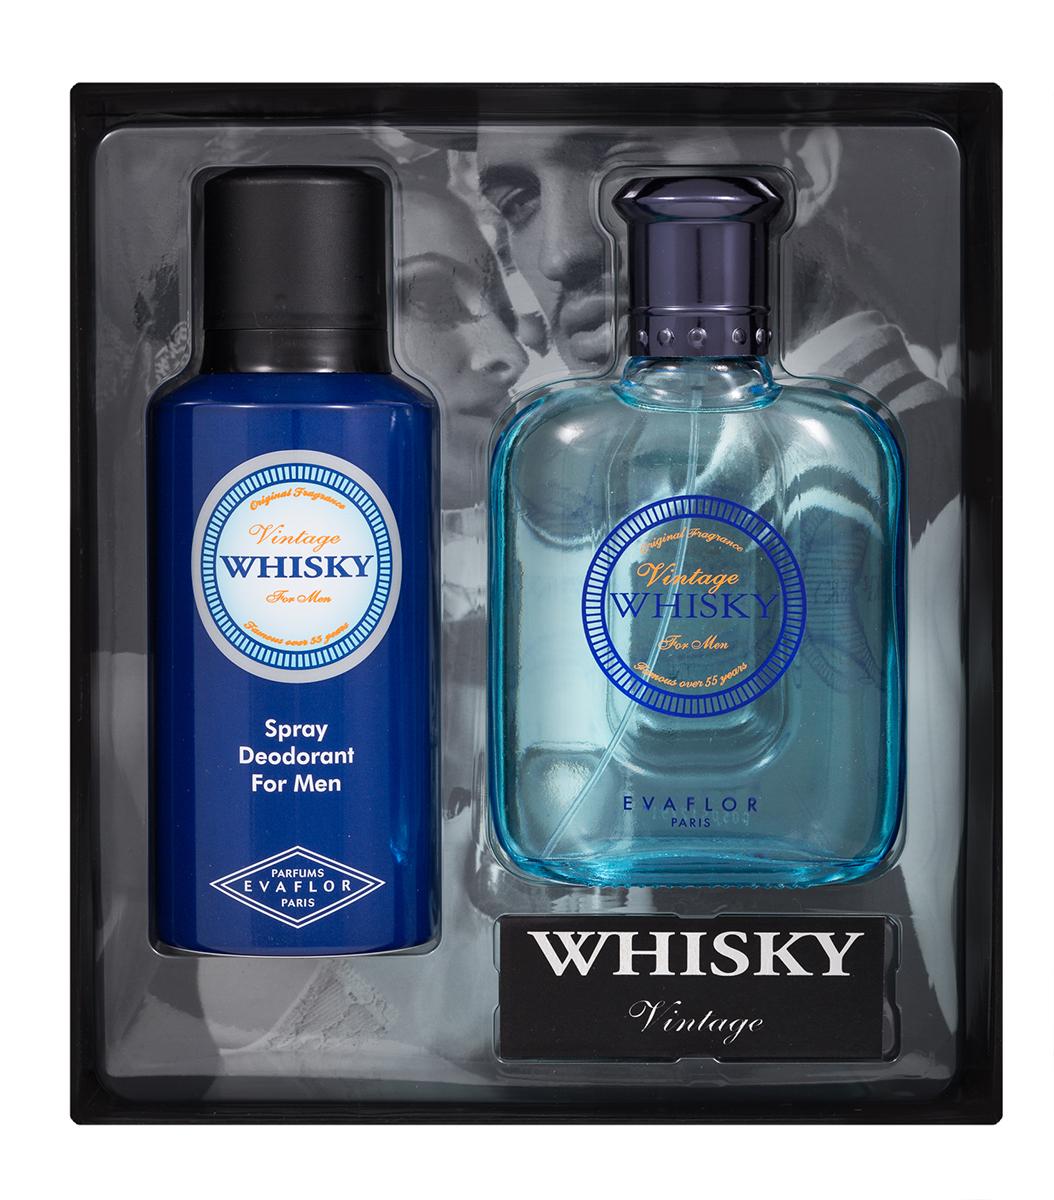 Evaflor Подарочный набор Whisky Vintageмужской: Туалетная вода,100 мл , дезодорант, 150 мл42898Подарочный набор для мужчин : туалетная вода 100мл, парфюмированный дезодорант 150 мл.